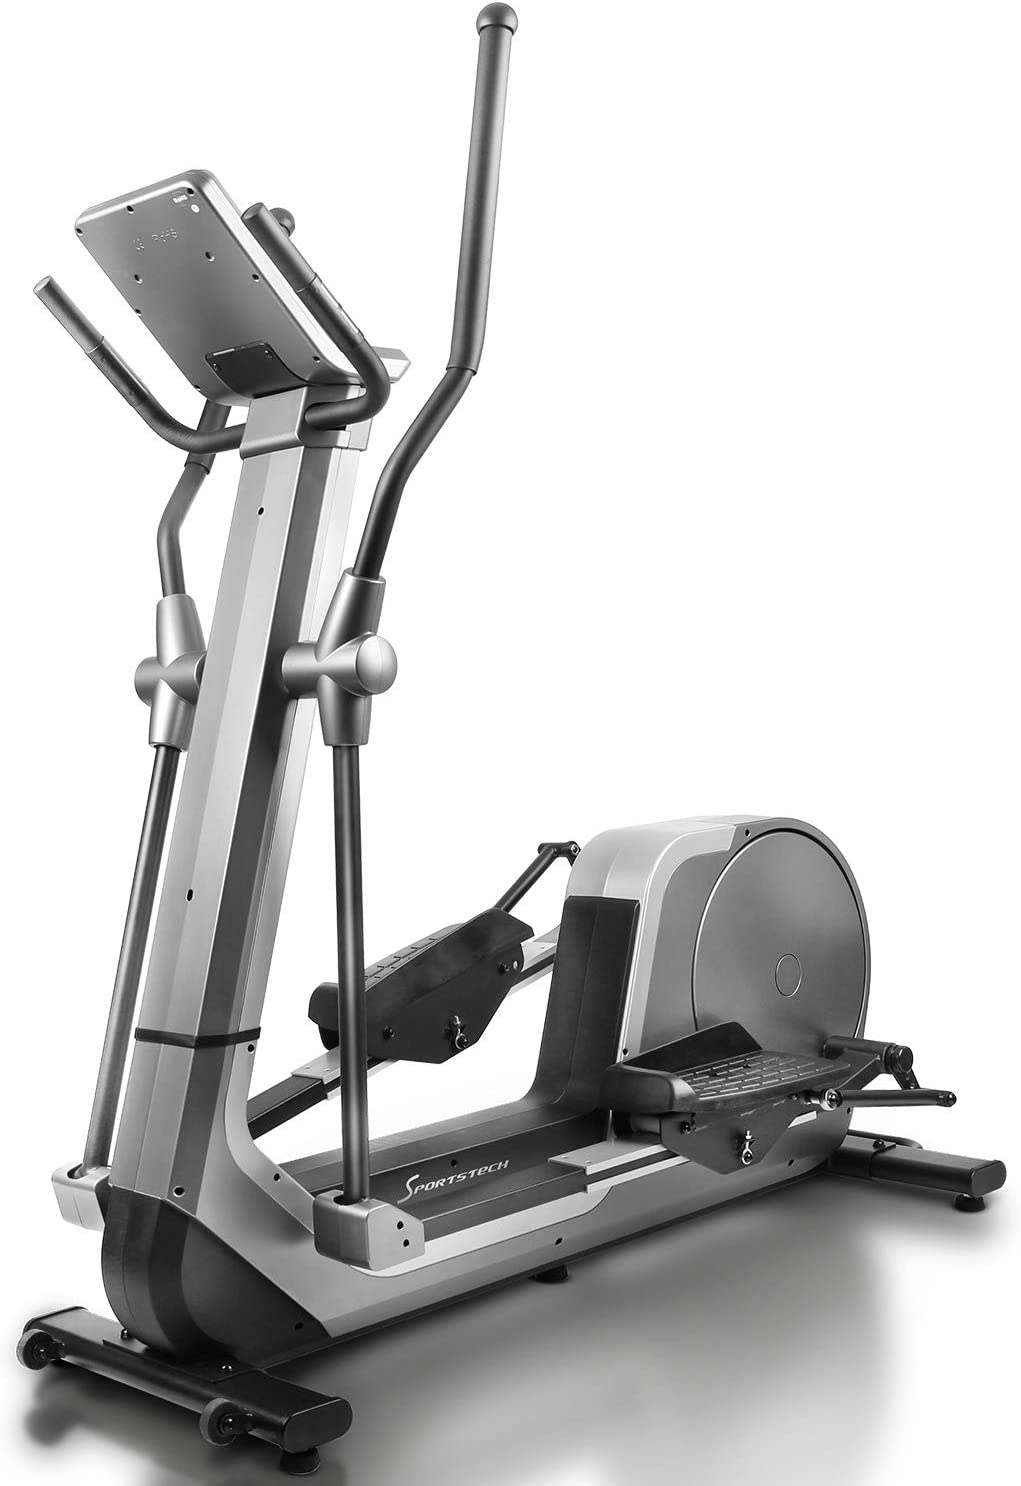 Sportstech Premium Bicicleta elíptica para Casa | Marca Alemana de Calidad | Eventos en Directo, App Multijugador & Consola Android | Elíptica para casa LCX800 | 12 programas & HRC-Mode - Vola